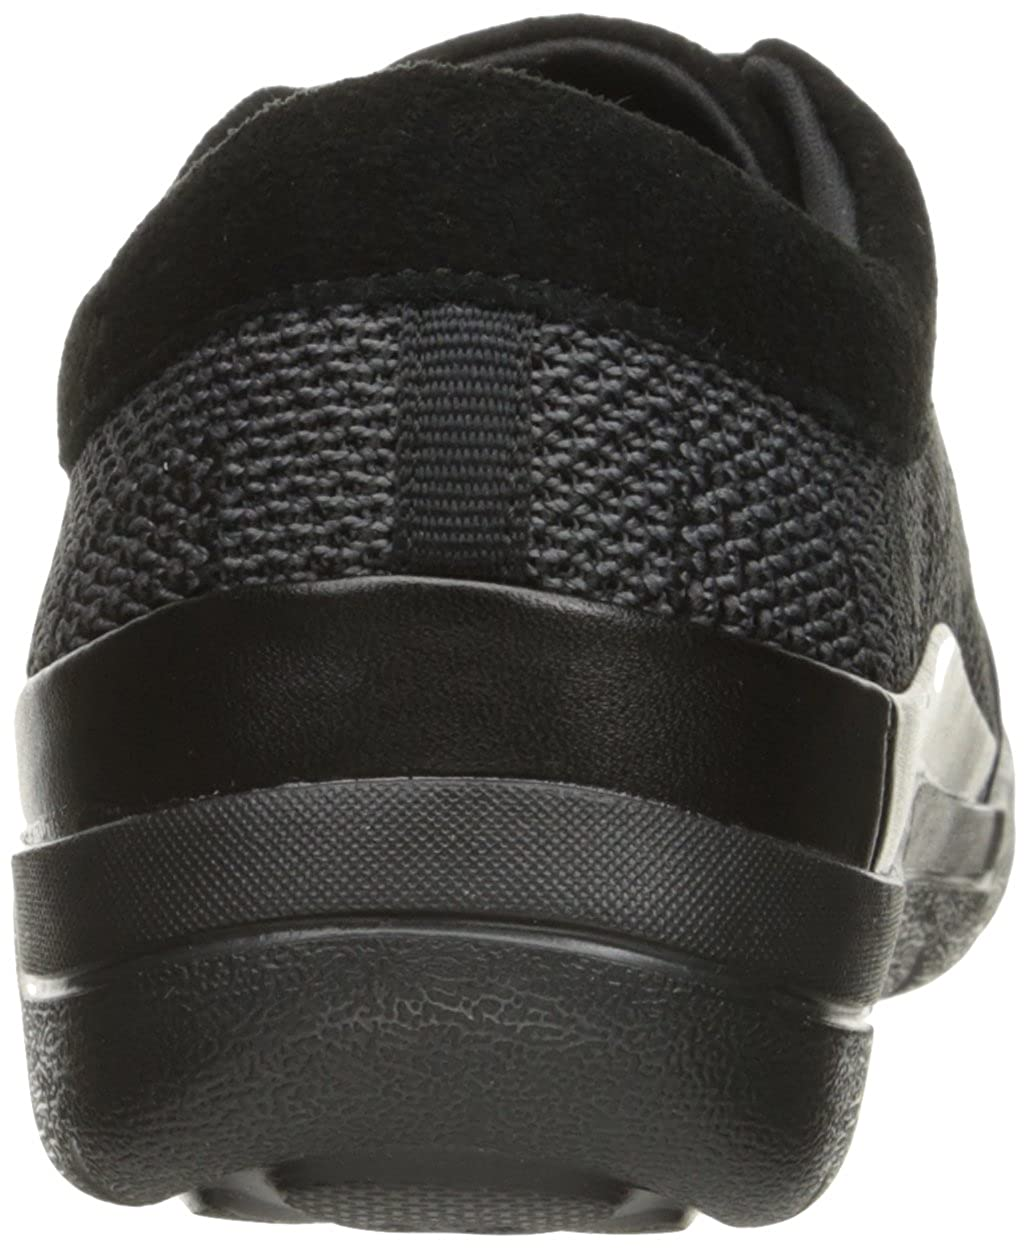 Skechers Lite Basse Step-Reactive, Scarpe da Ginnastica Basse Lite Donna Nero 8e4f59